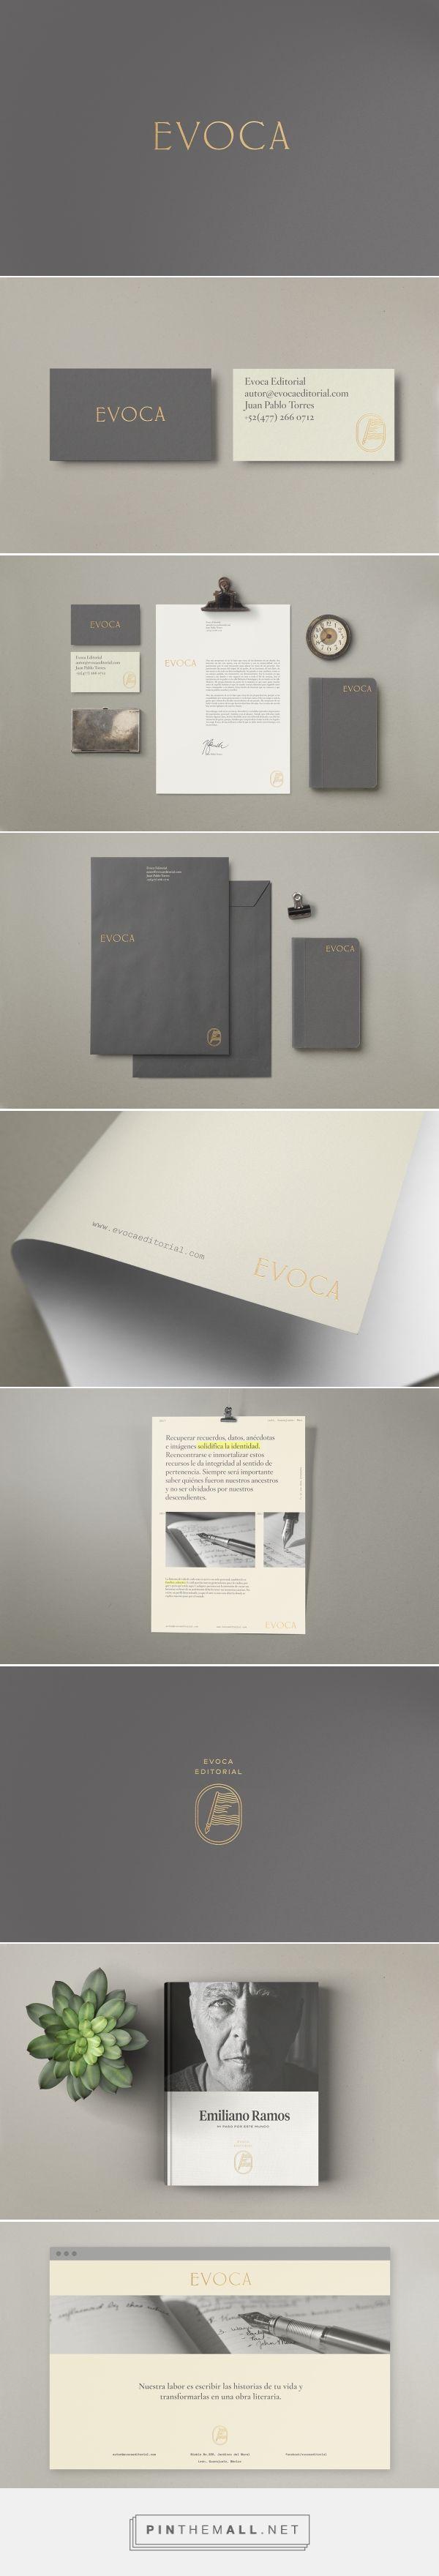 Evoca Editorial Branding by Treceveinte | Fivestar Branding Agency – Design and Branding Agency & Curated Inspiration Gallery